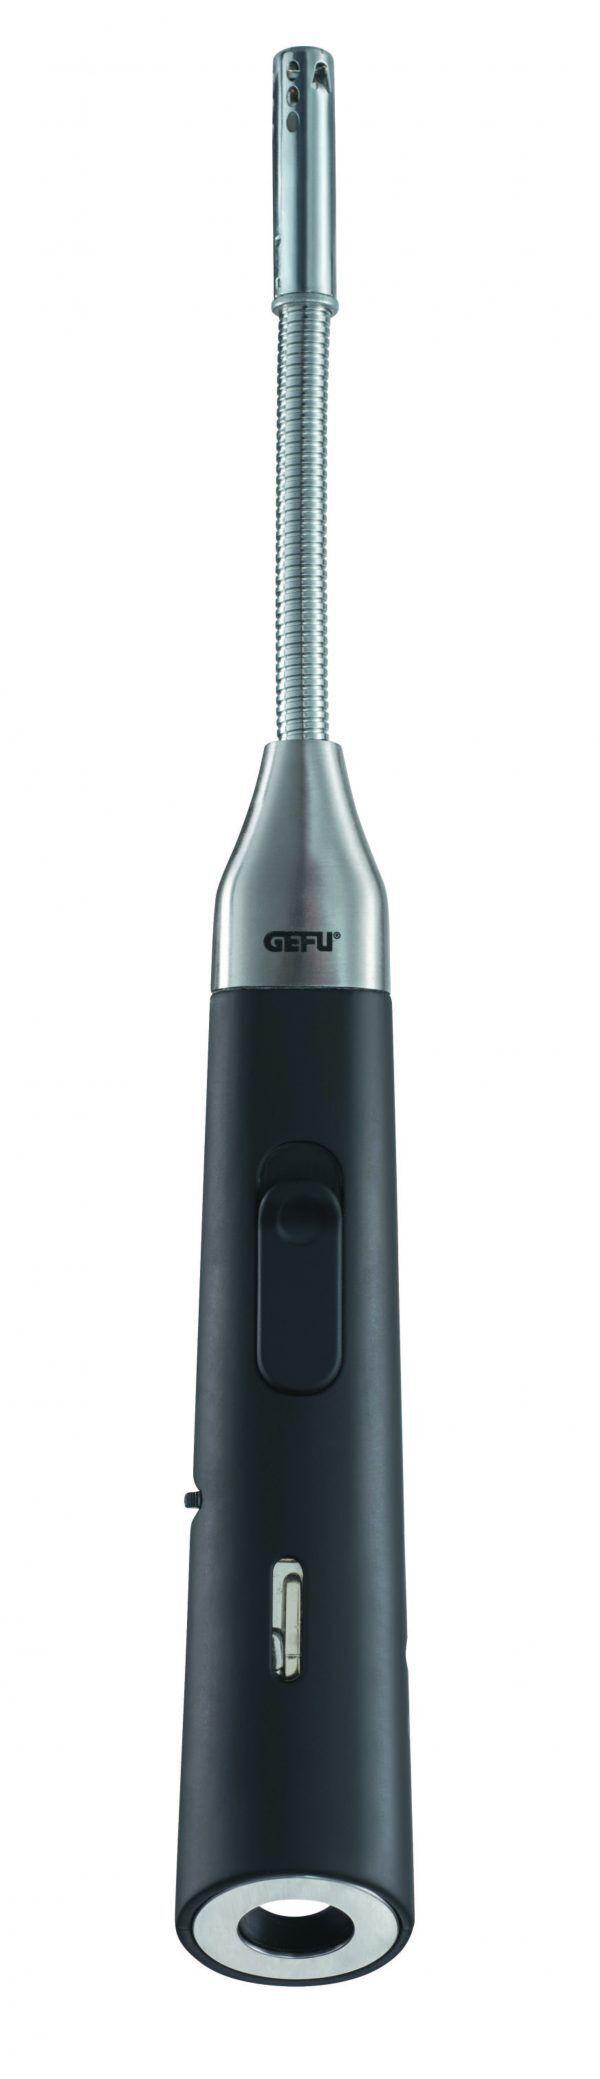 12990 lighter1 2 Марка: GEFU - GERMANY <br />Модел: GEFU 12990<br />Доставка: 2-4 работни дни<br />Гаранция: 2 години